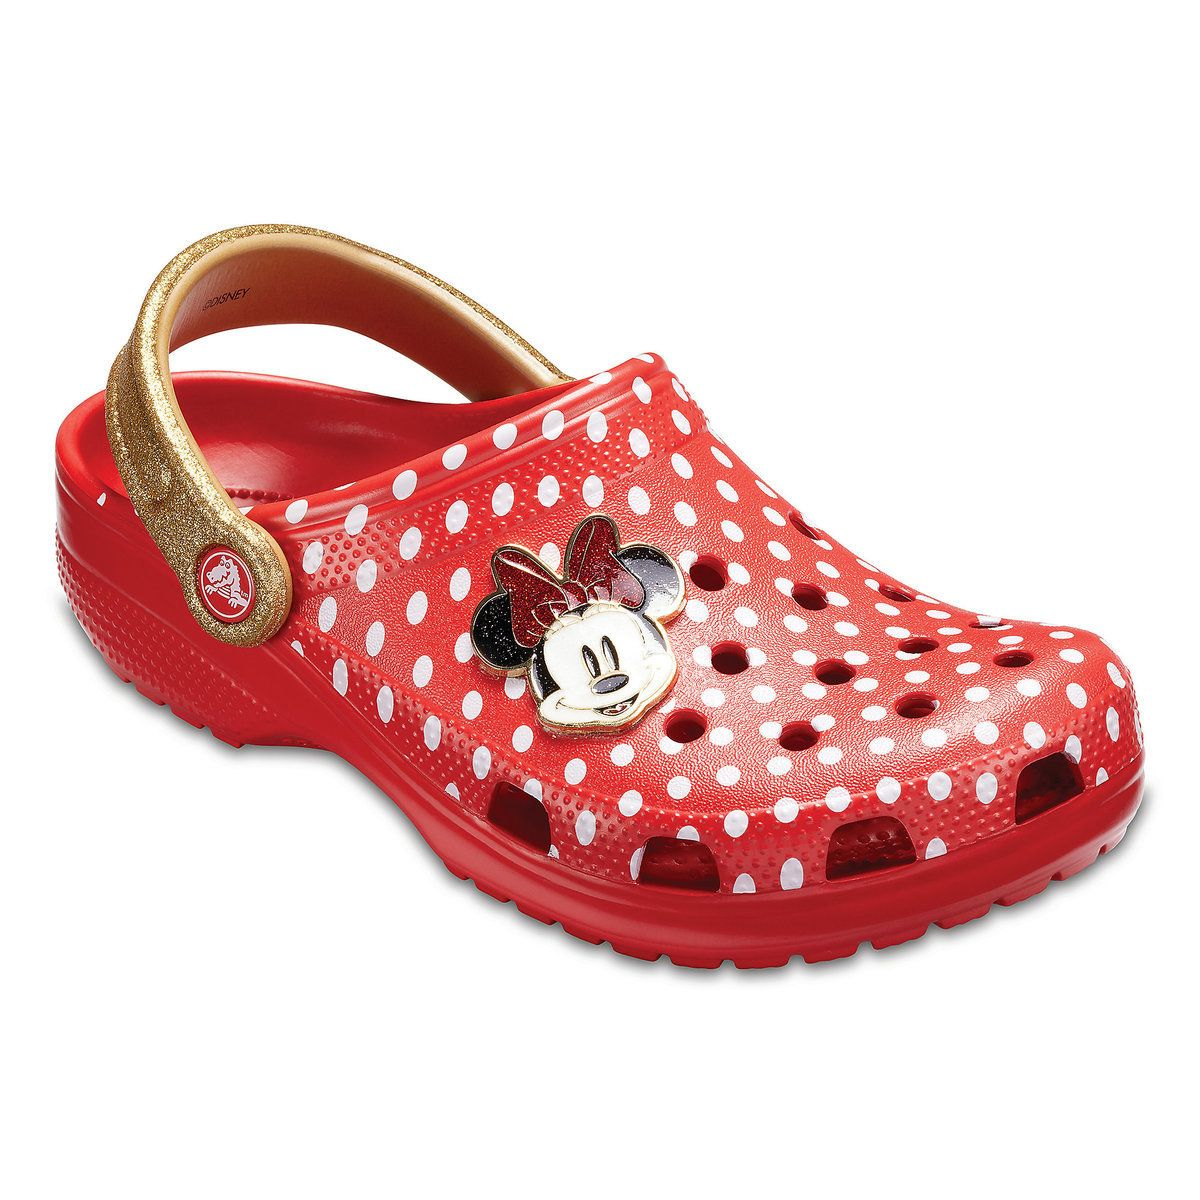 Crocs Womens Boys and Girls Minnie Dots Clog